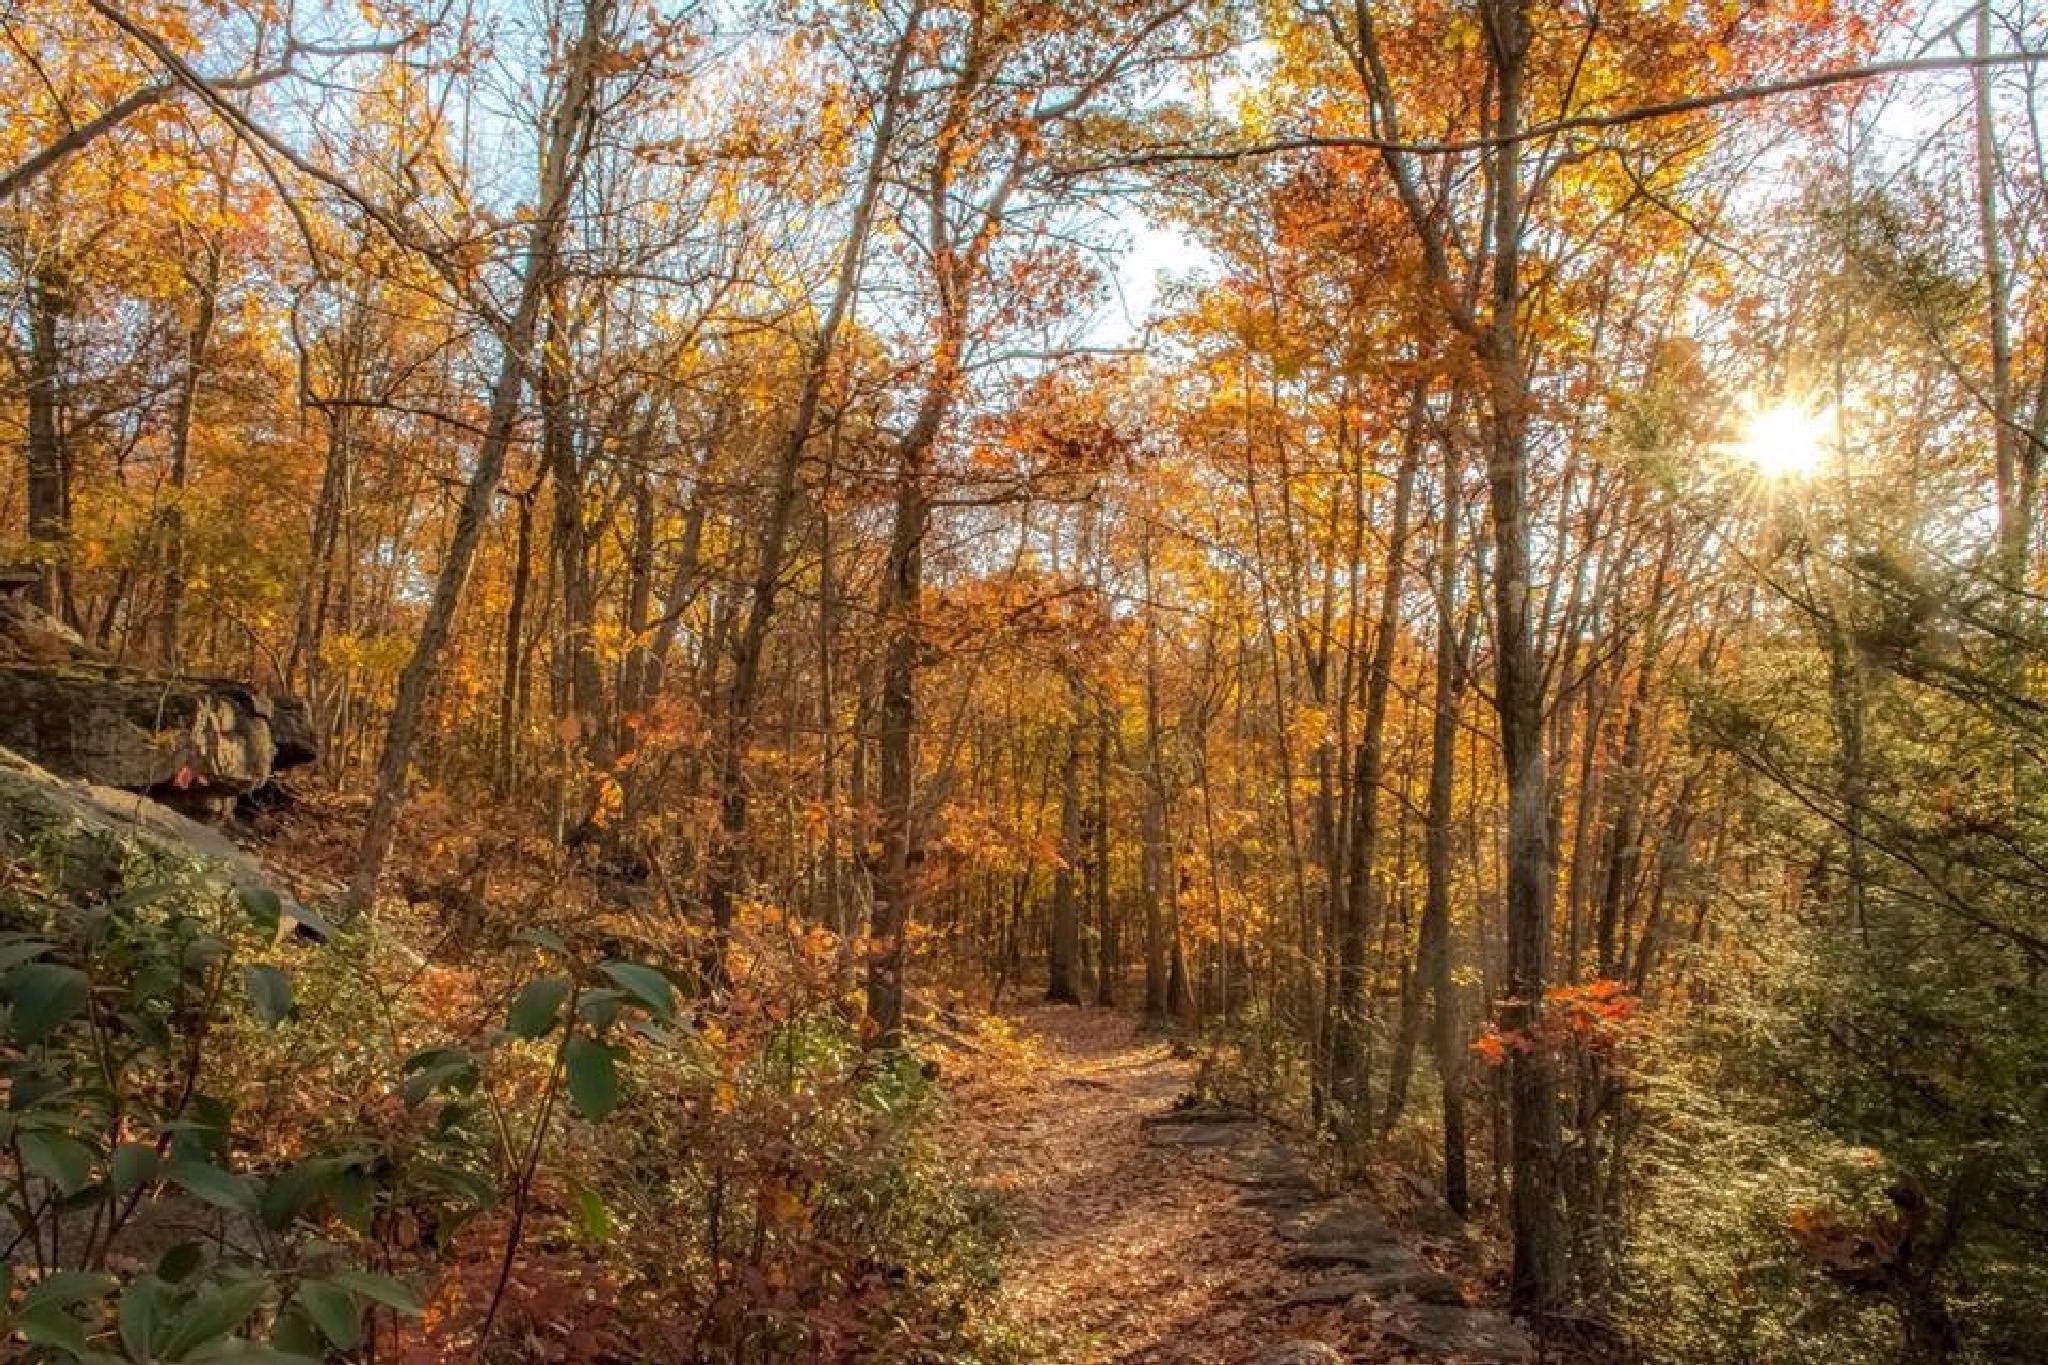 Autumn walk by Advenini